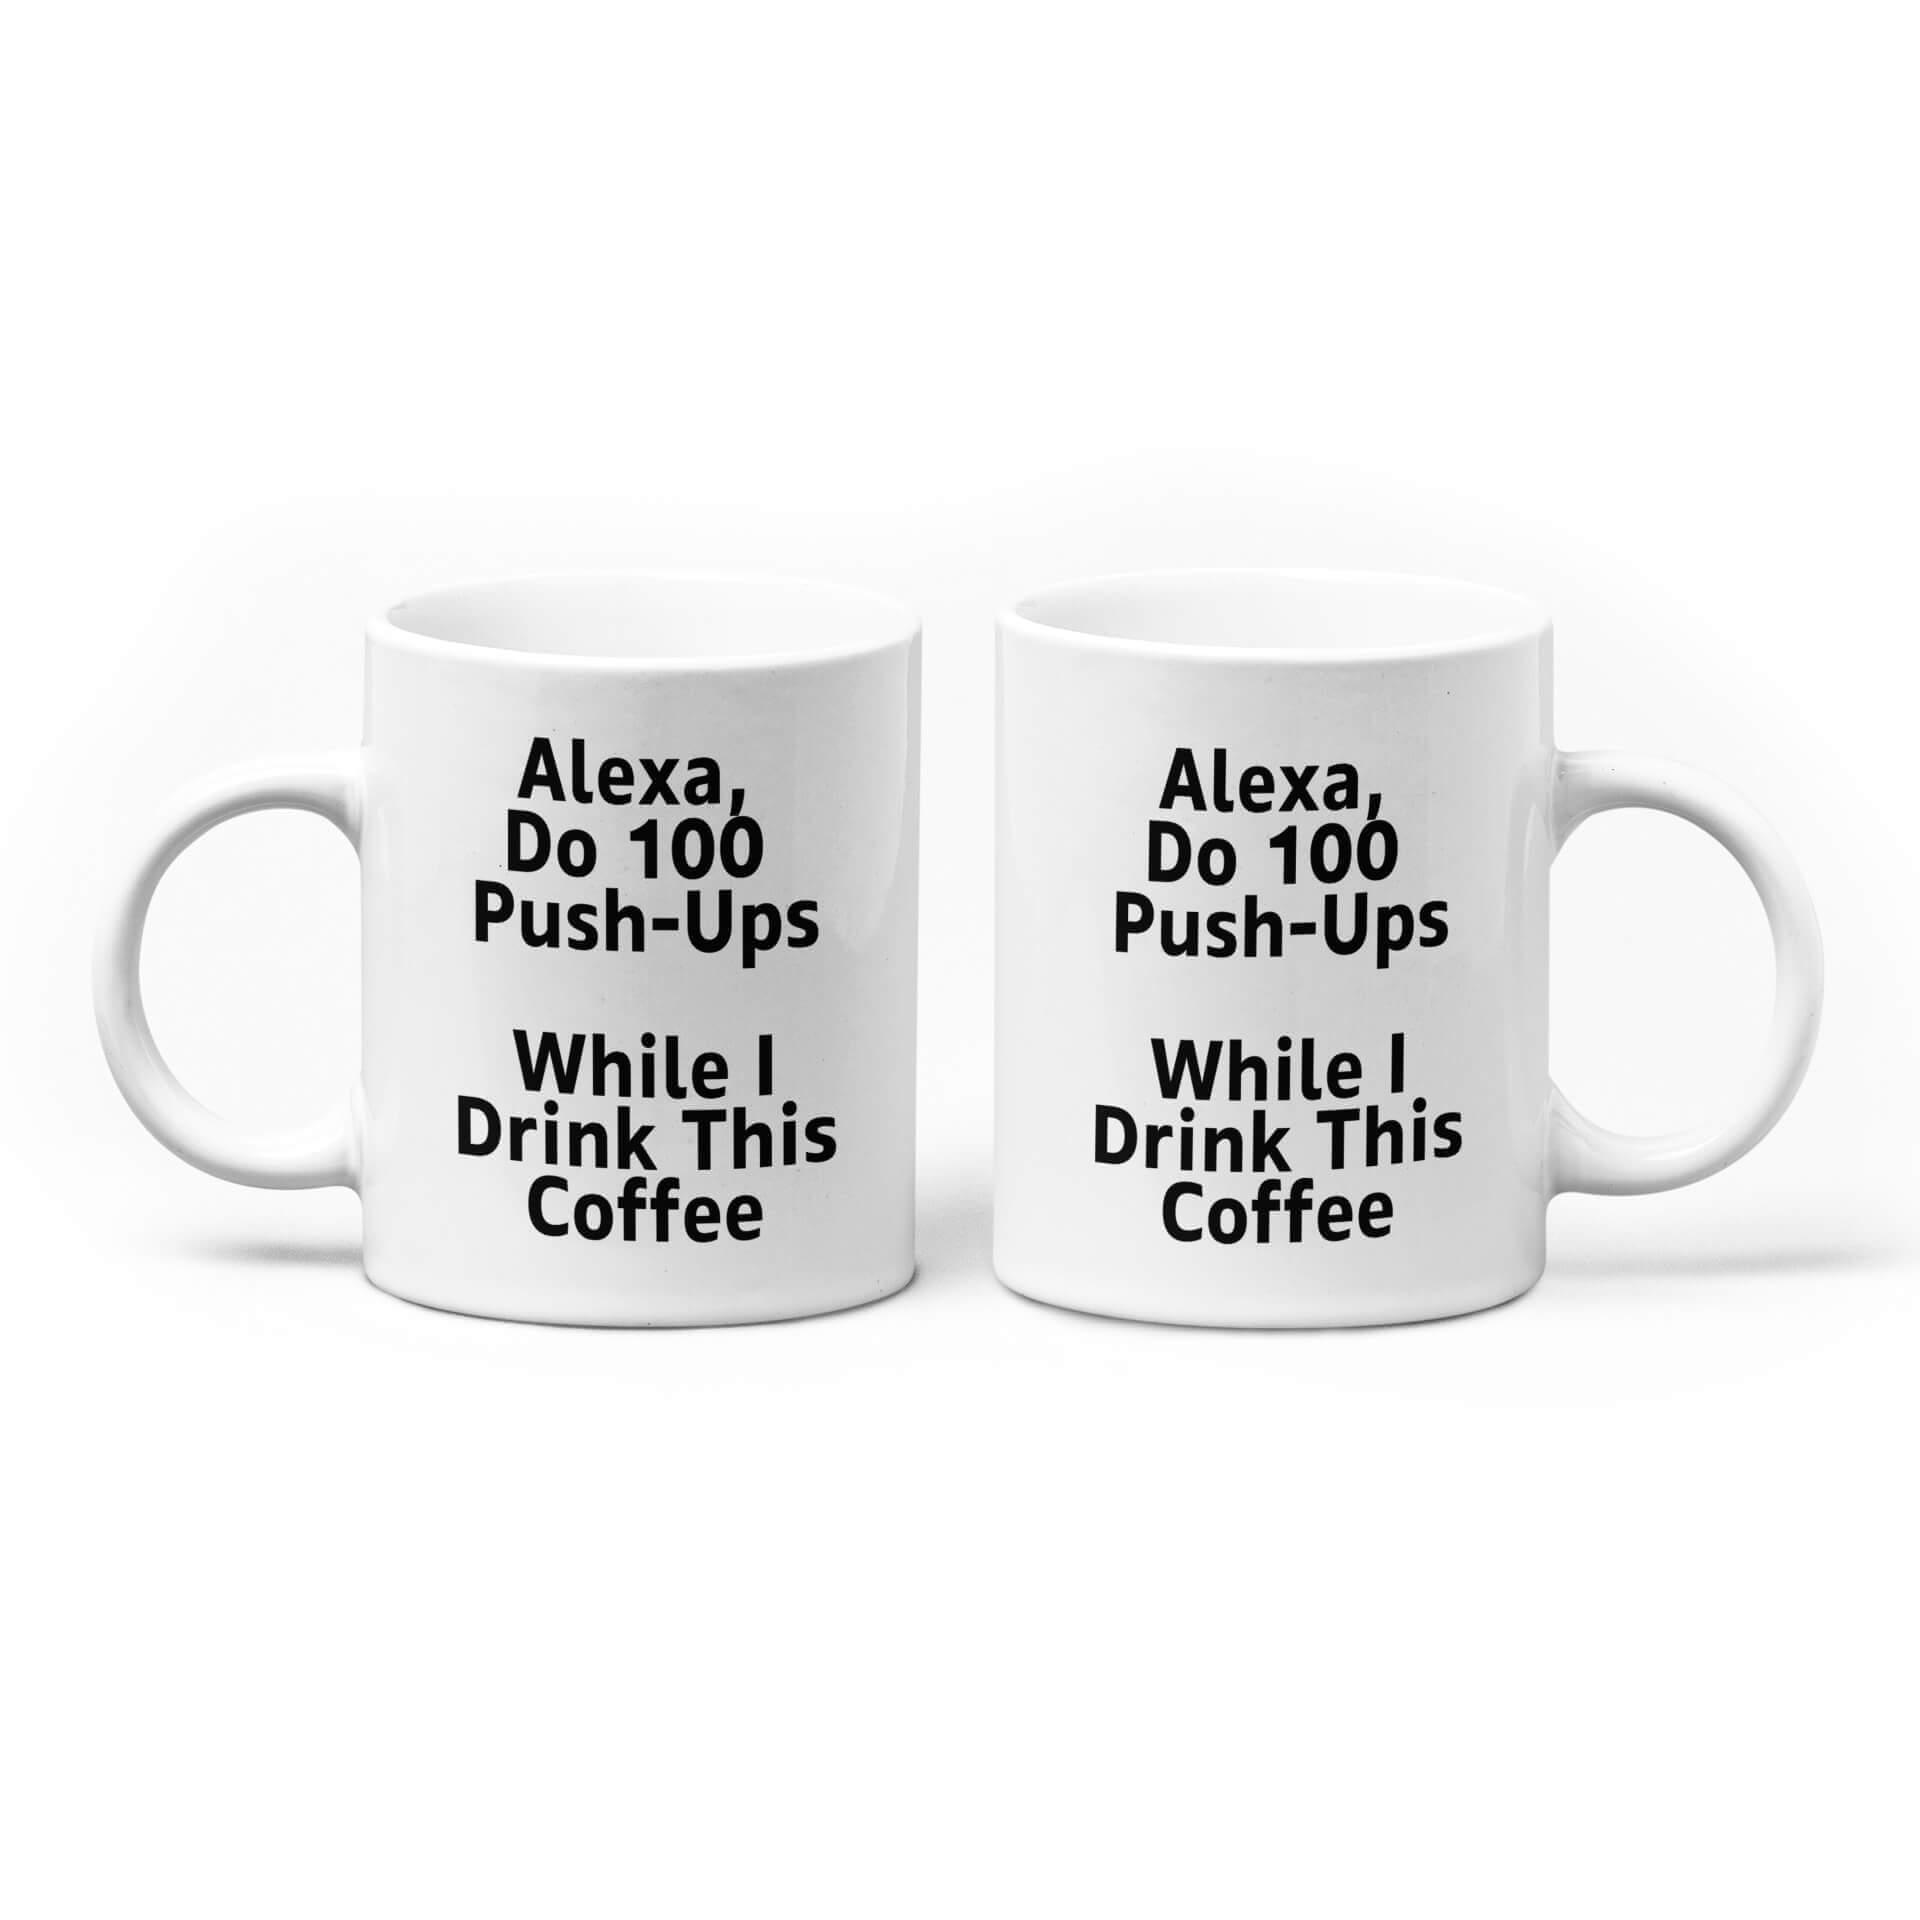 Alexa, Do 100 Push-Ups While I Drink This Coffee Mug